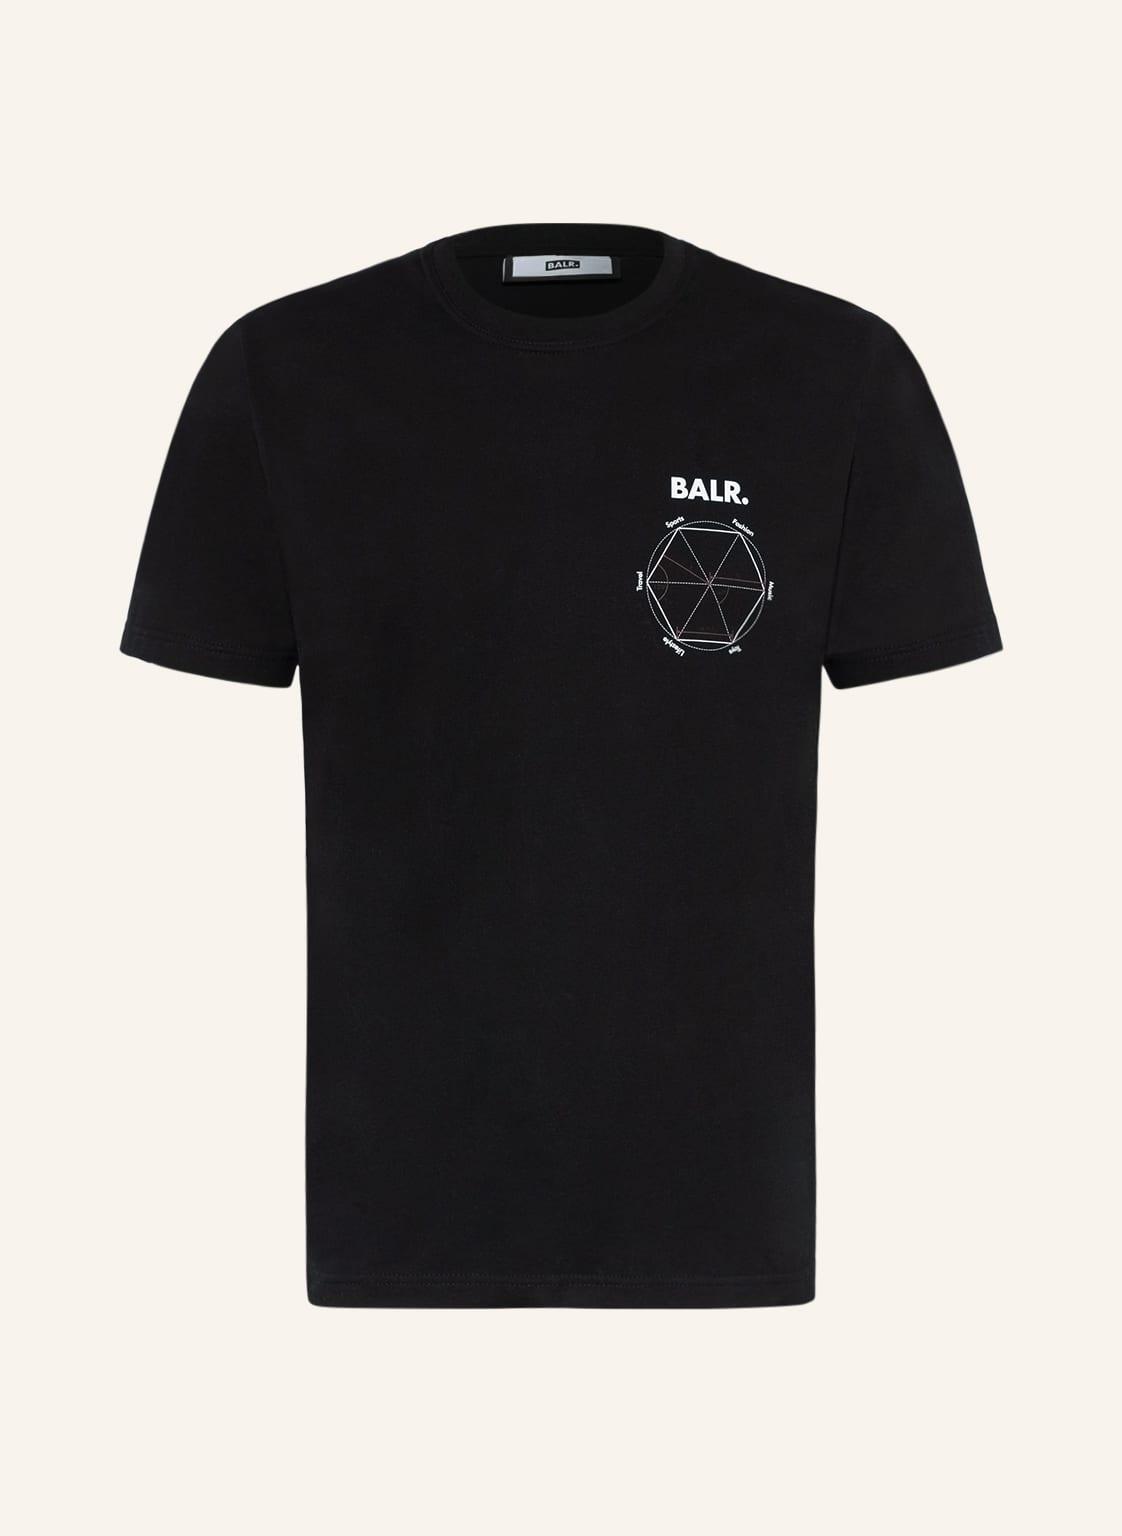 Image of Balr. T-Shirt Olaf schwarz